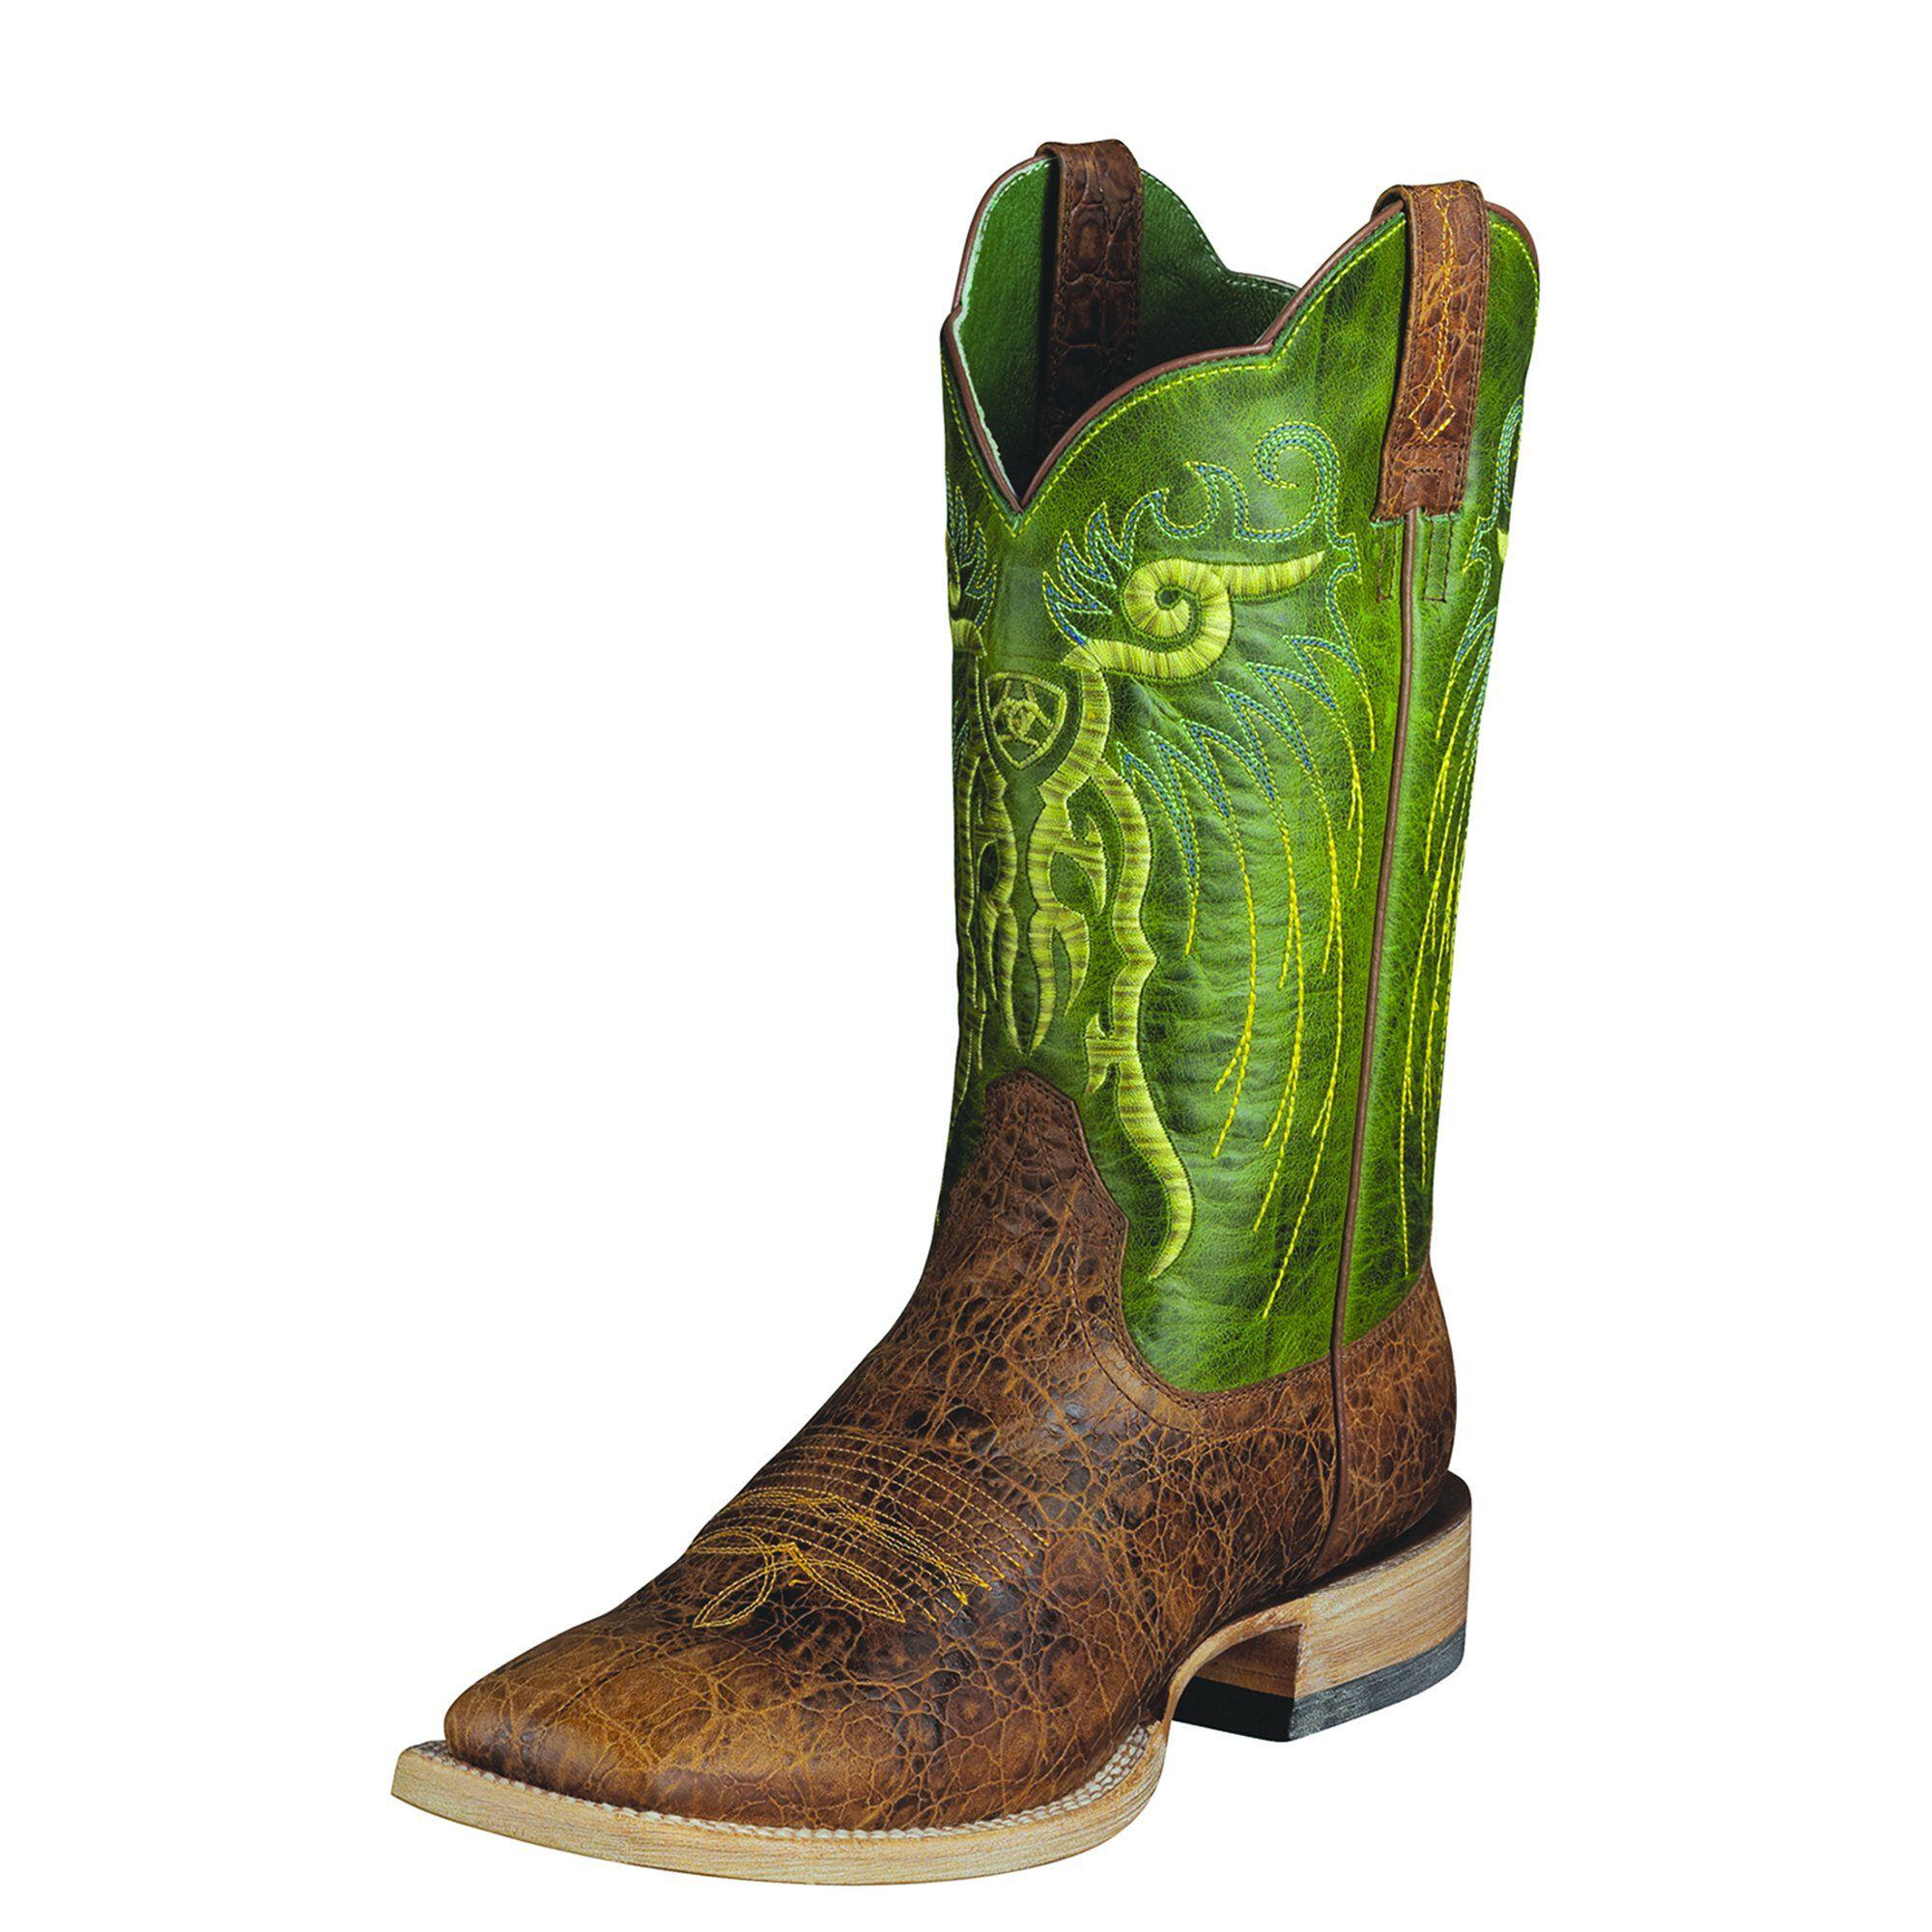 Ariat Mesteno Boots